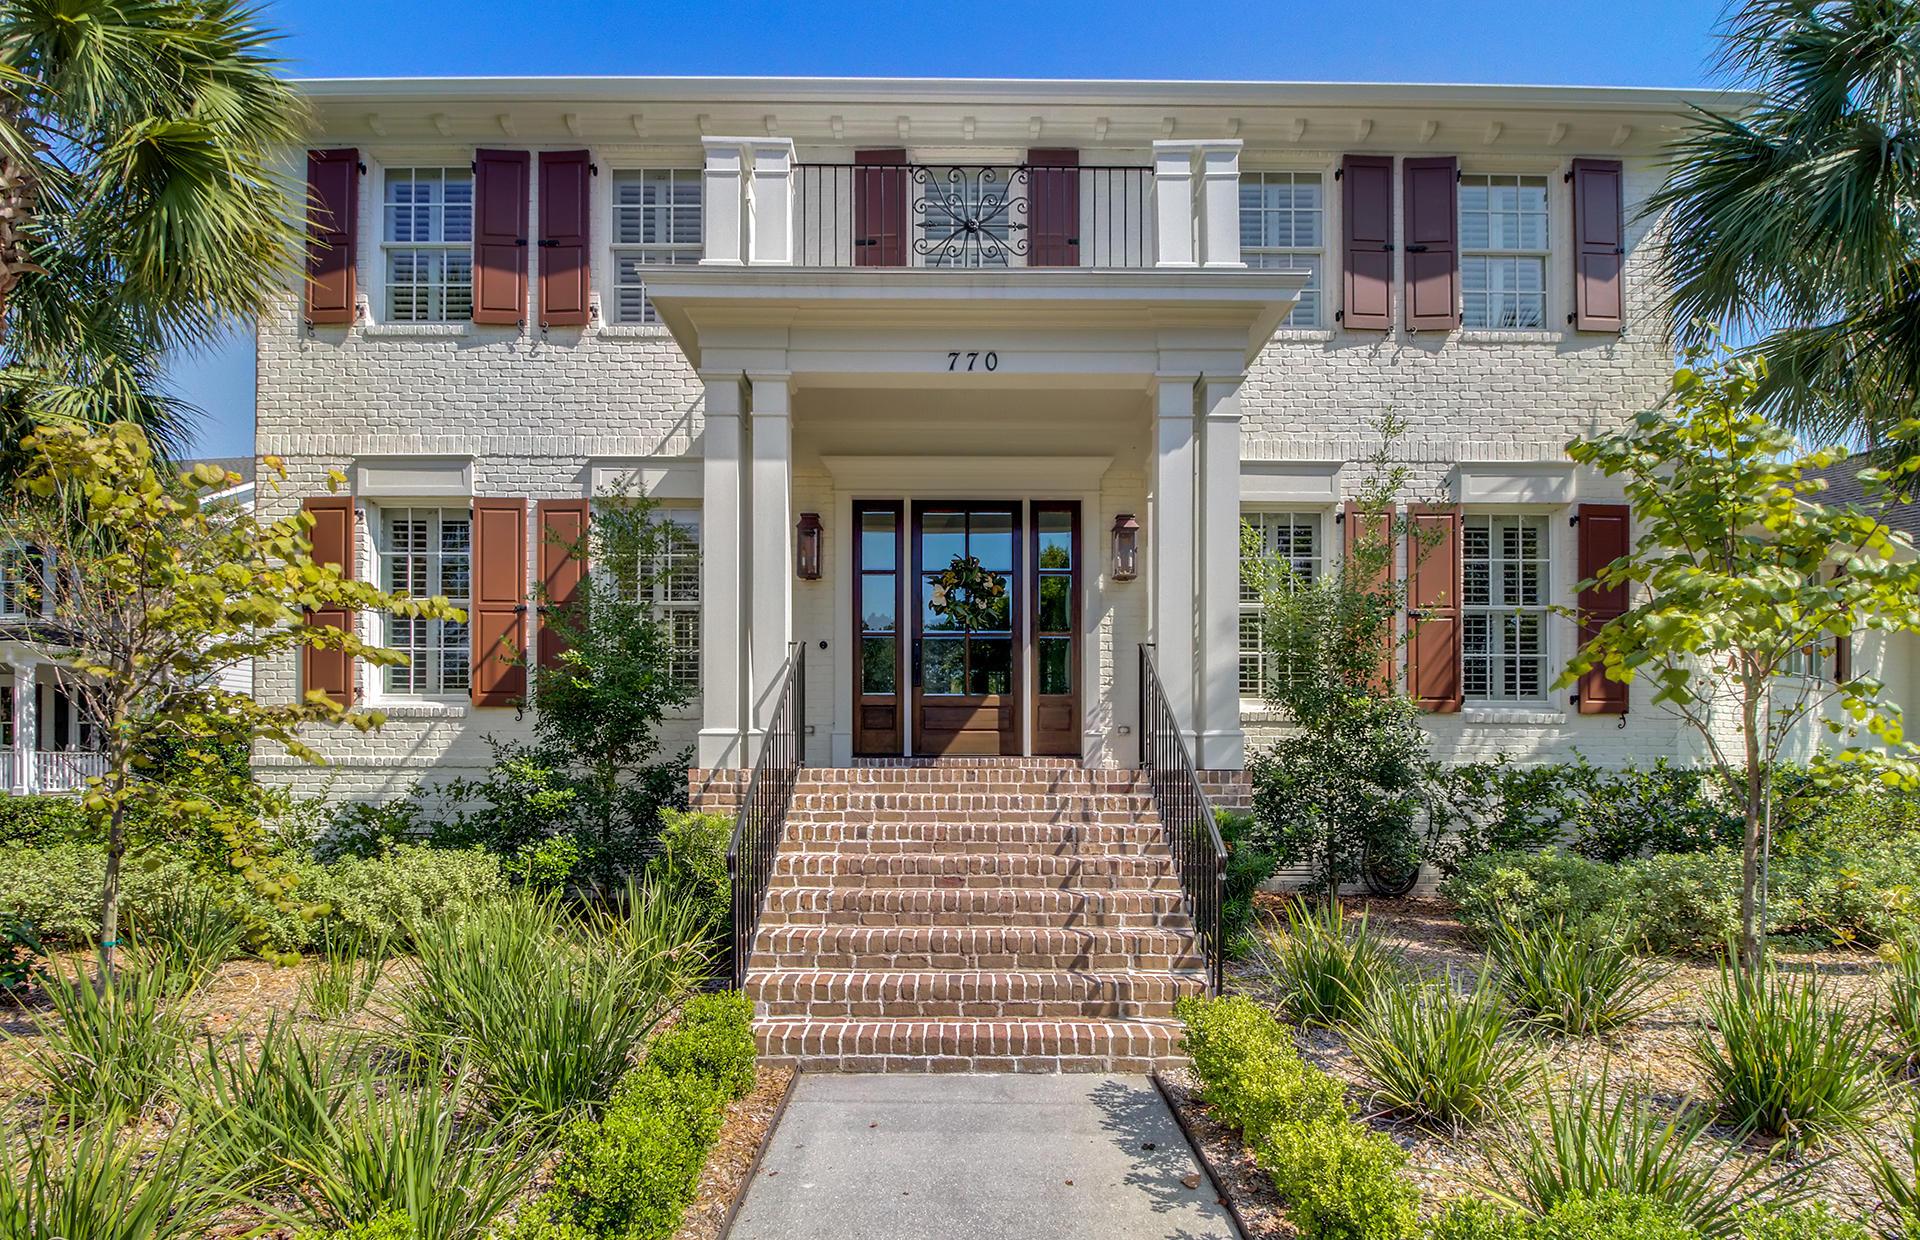 Olde Park Homes For Sale - 770 Olde Central, Mount Pleasant, SC - 81